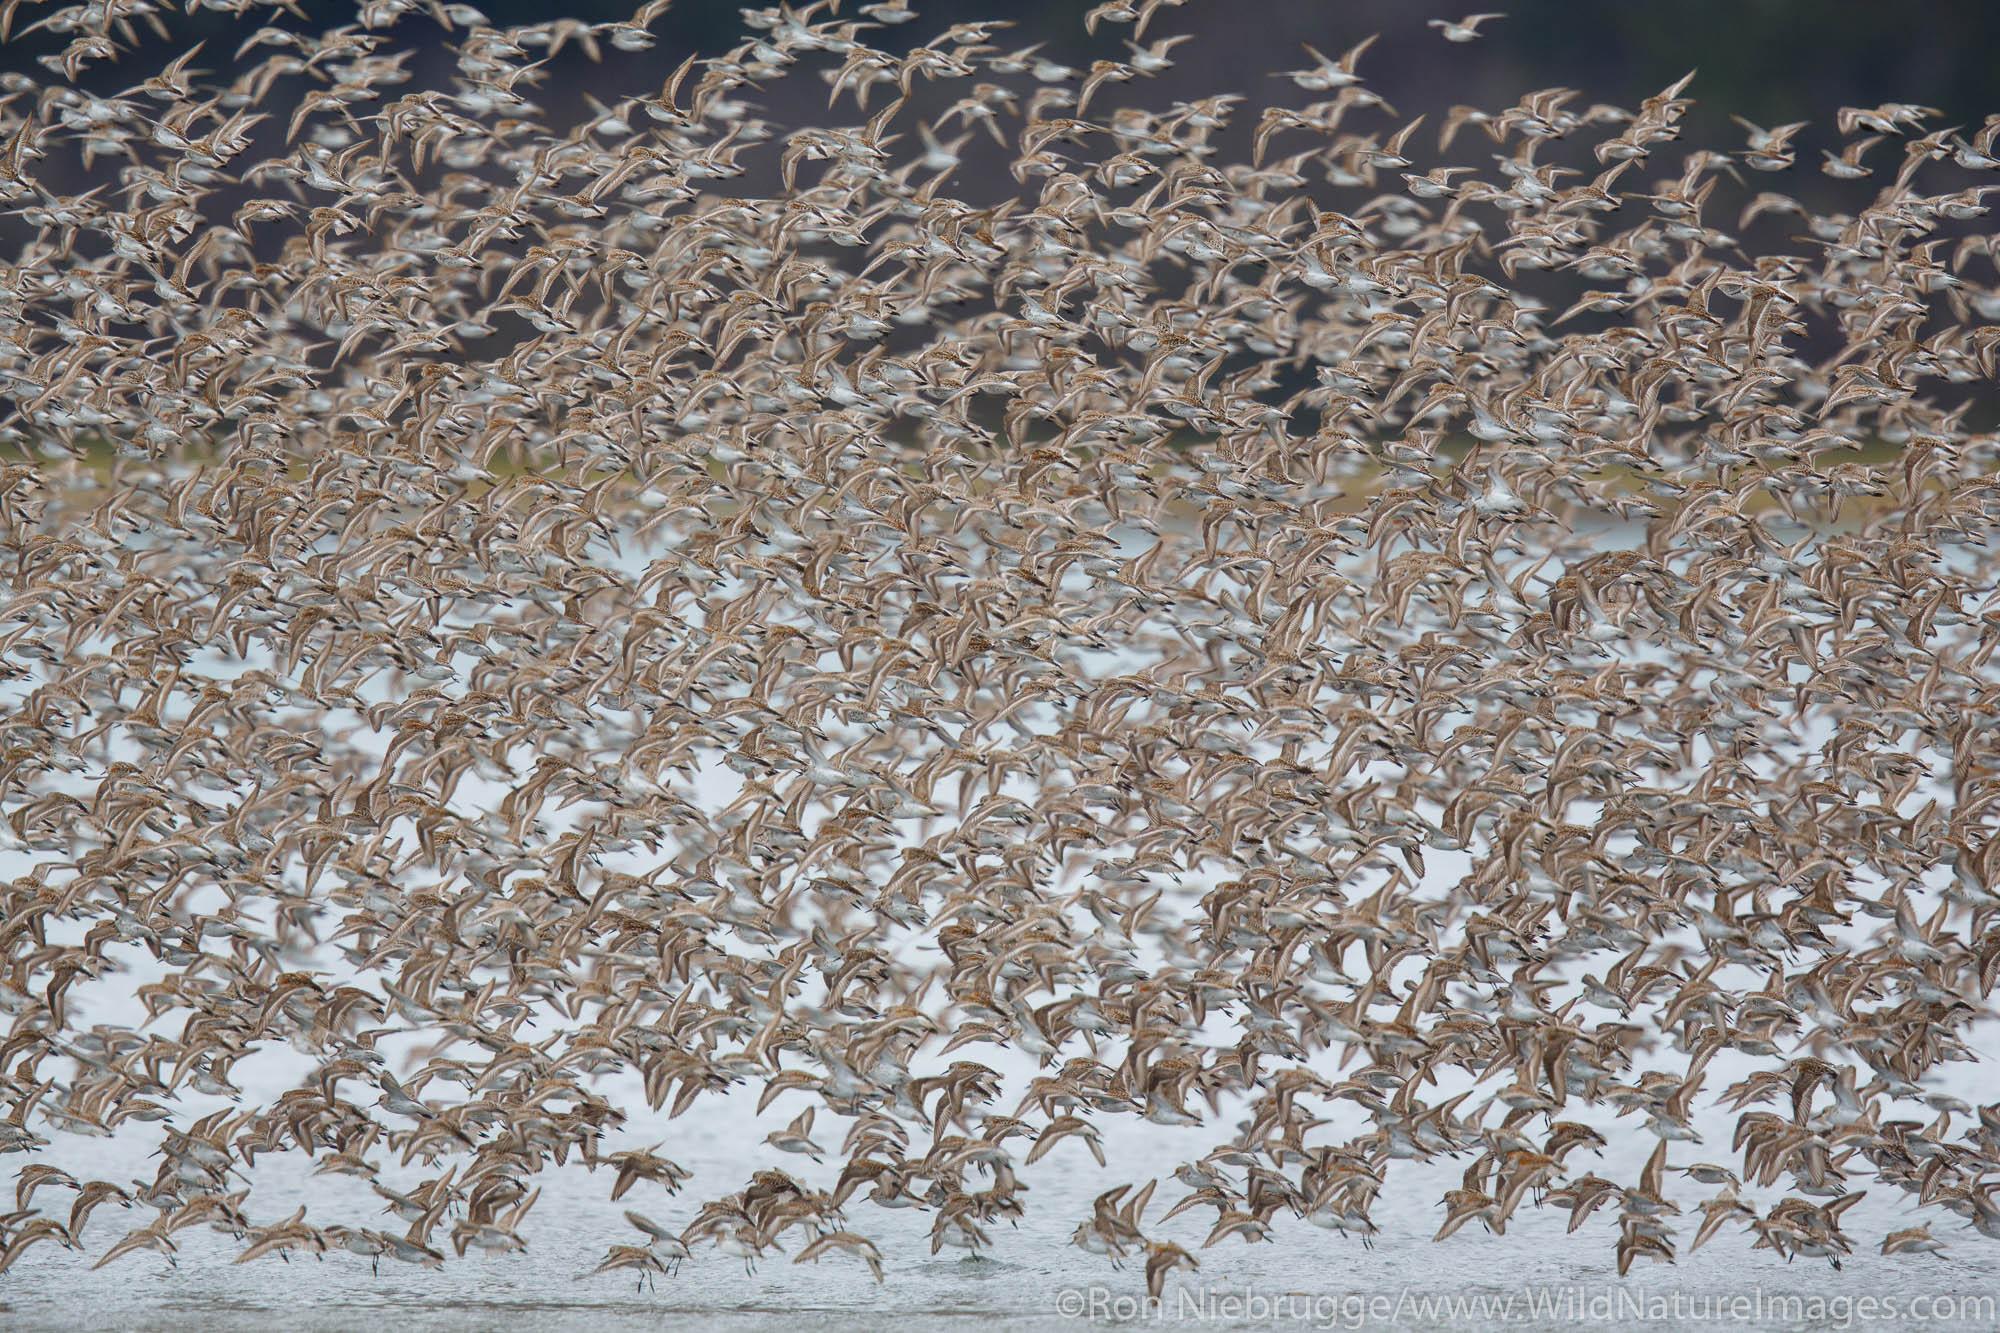 Shorebird migration, Prince William Sound, Chugach National Forest, Cordova Alaska.